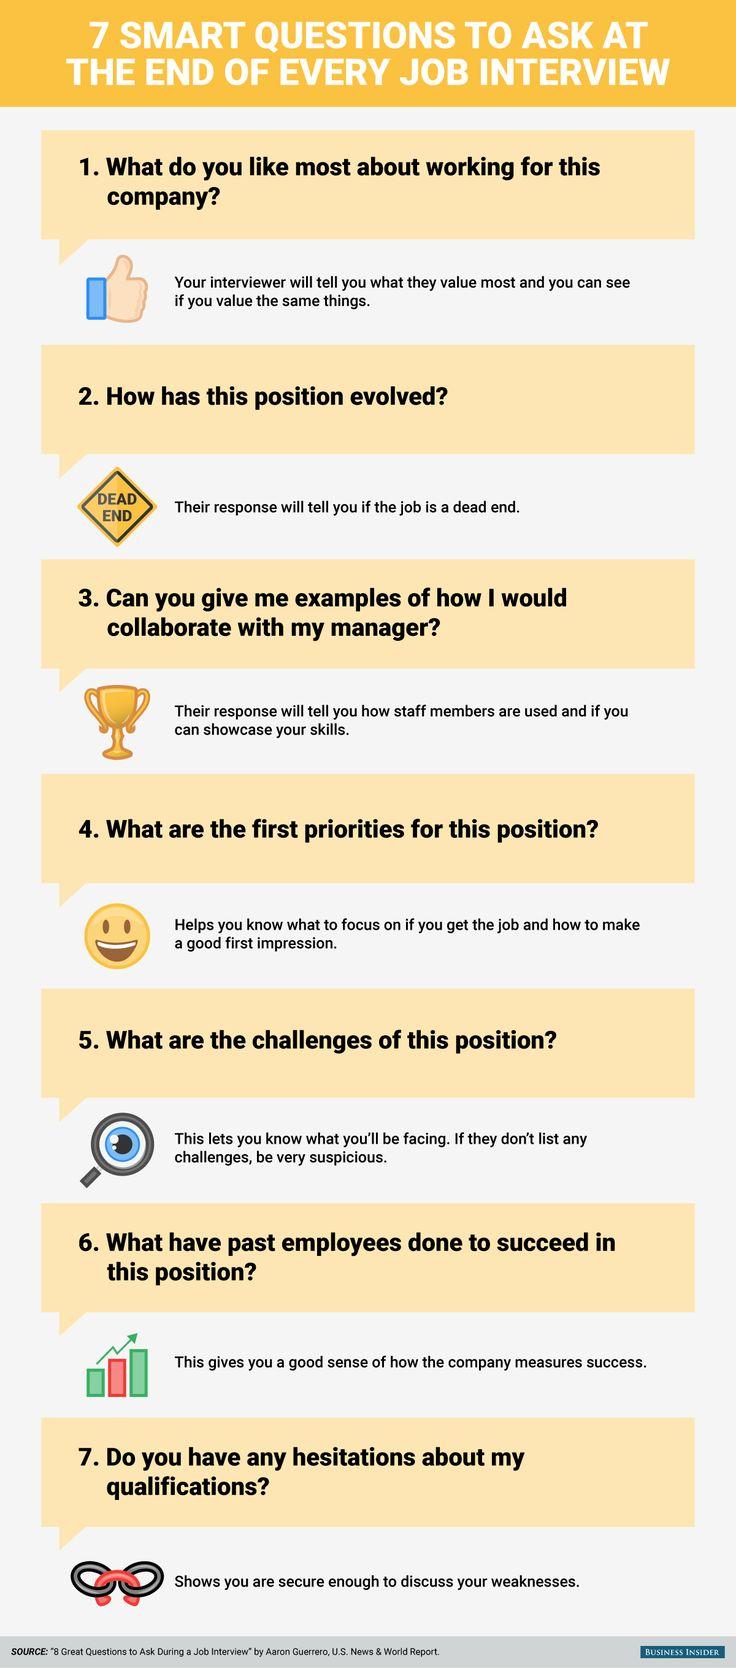 english teacher cv duties professional resume cover letter sample english teacher cv duties cambridge english teacher good interview questions to ask template